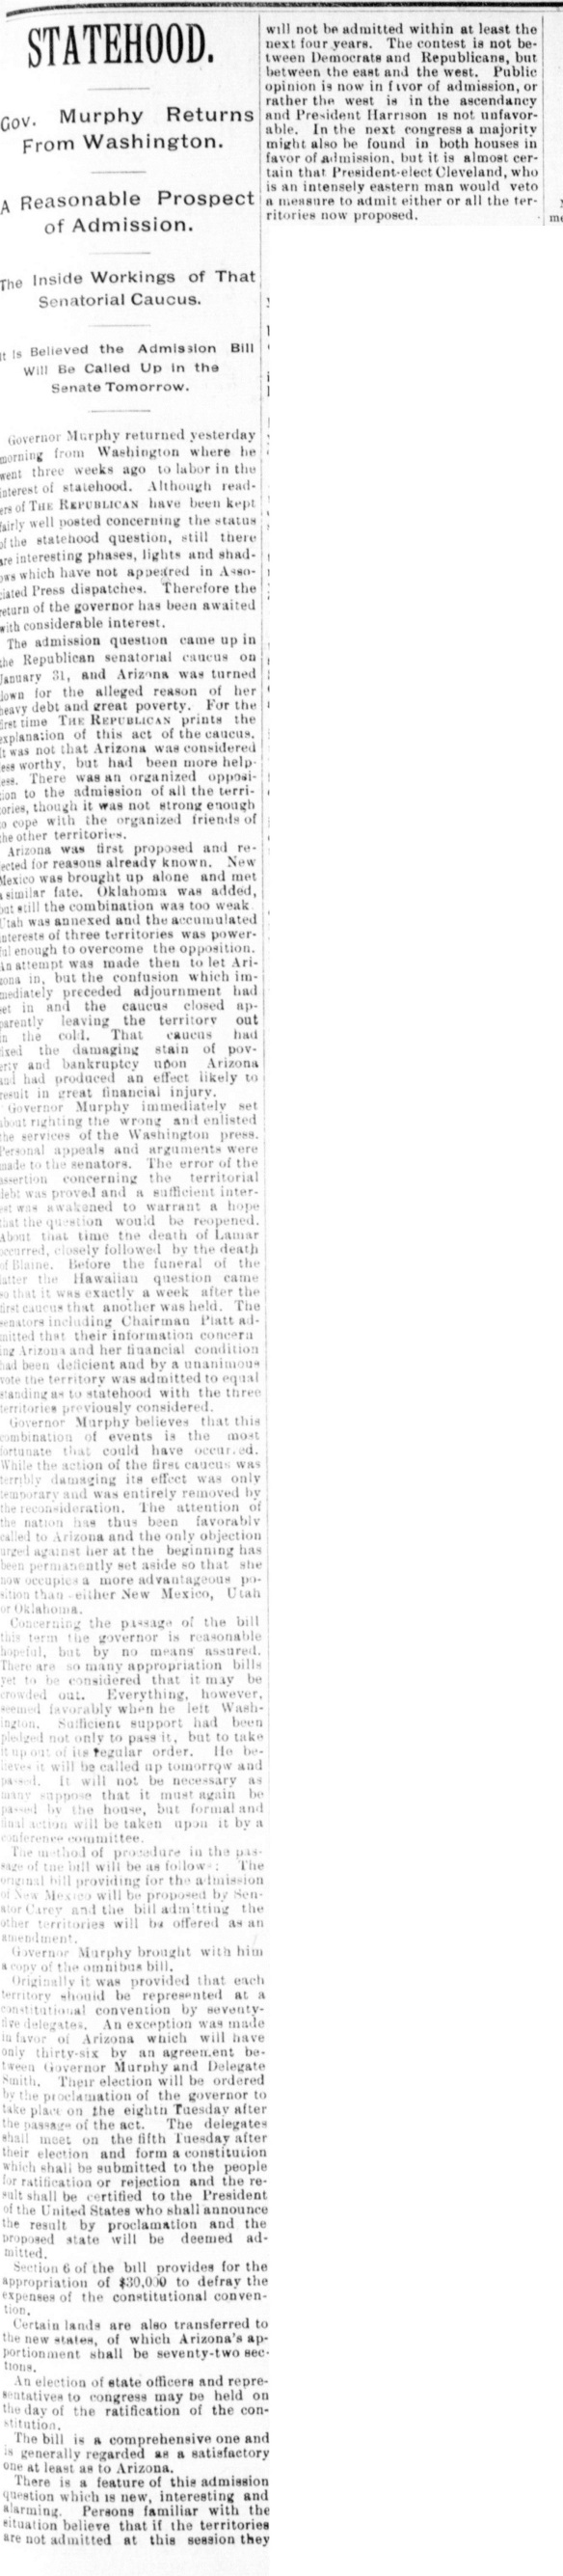 RepublicanMurphyStatehood1893-02-10